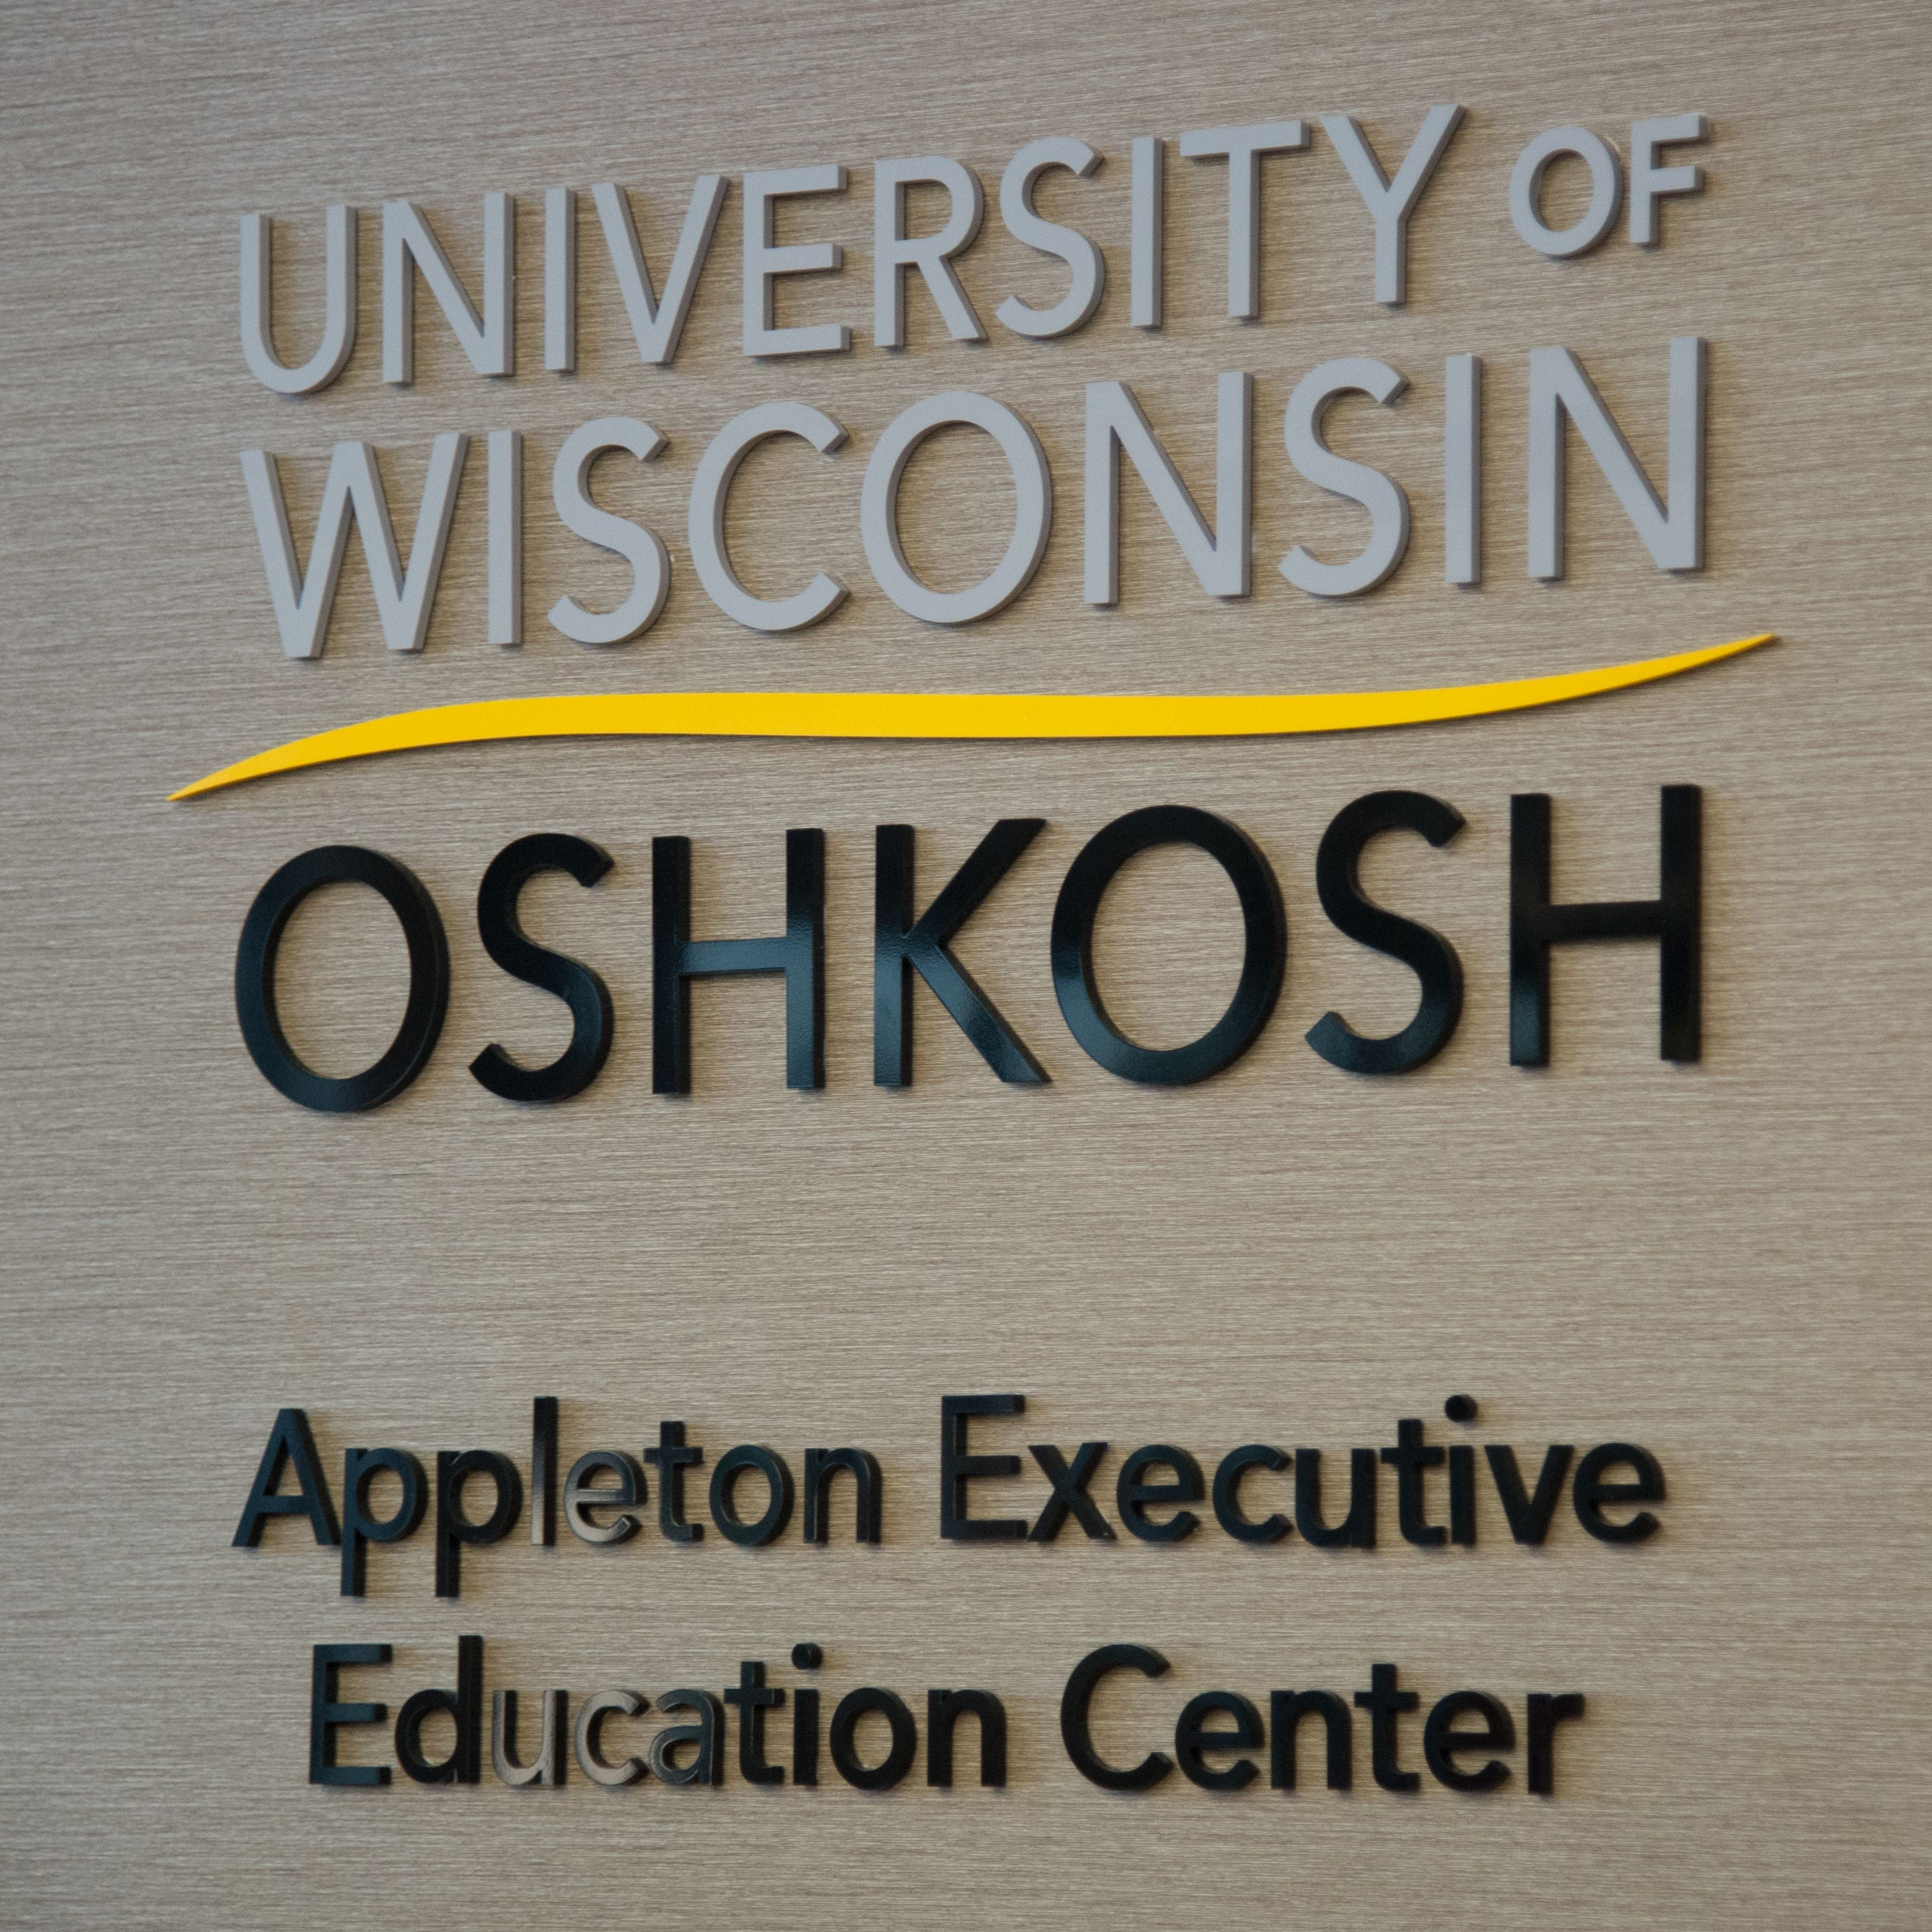 UW Oshkosh College of Business Appleton Executive